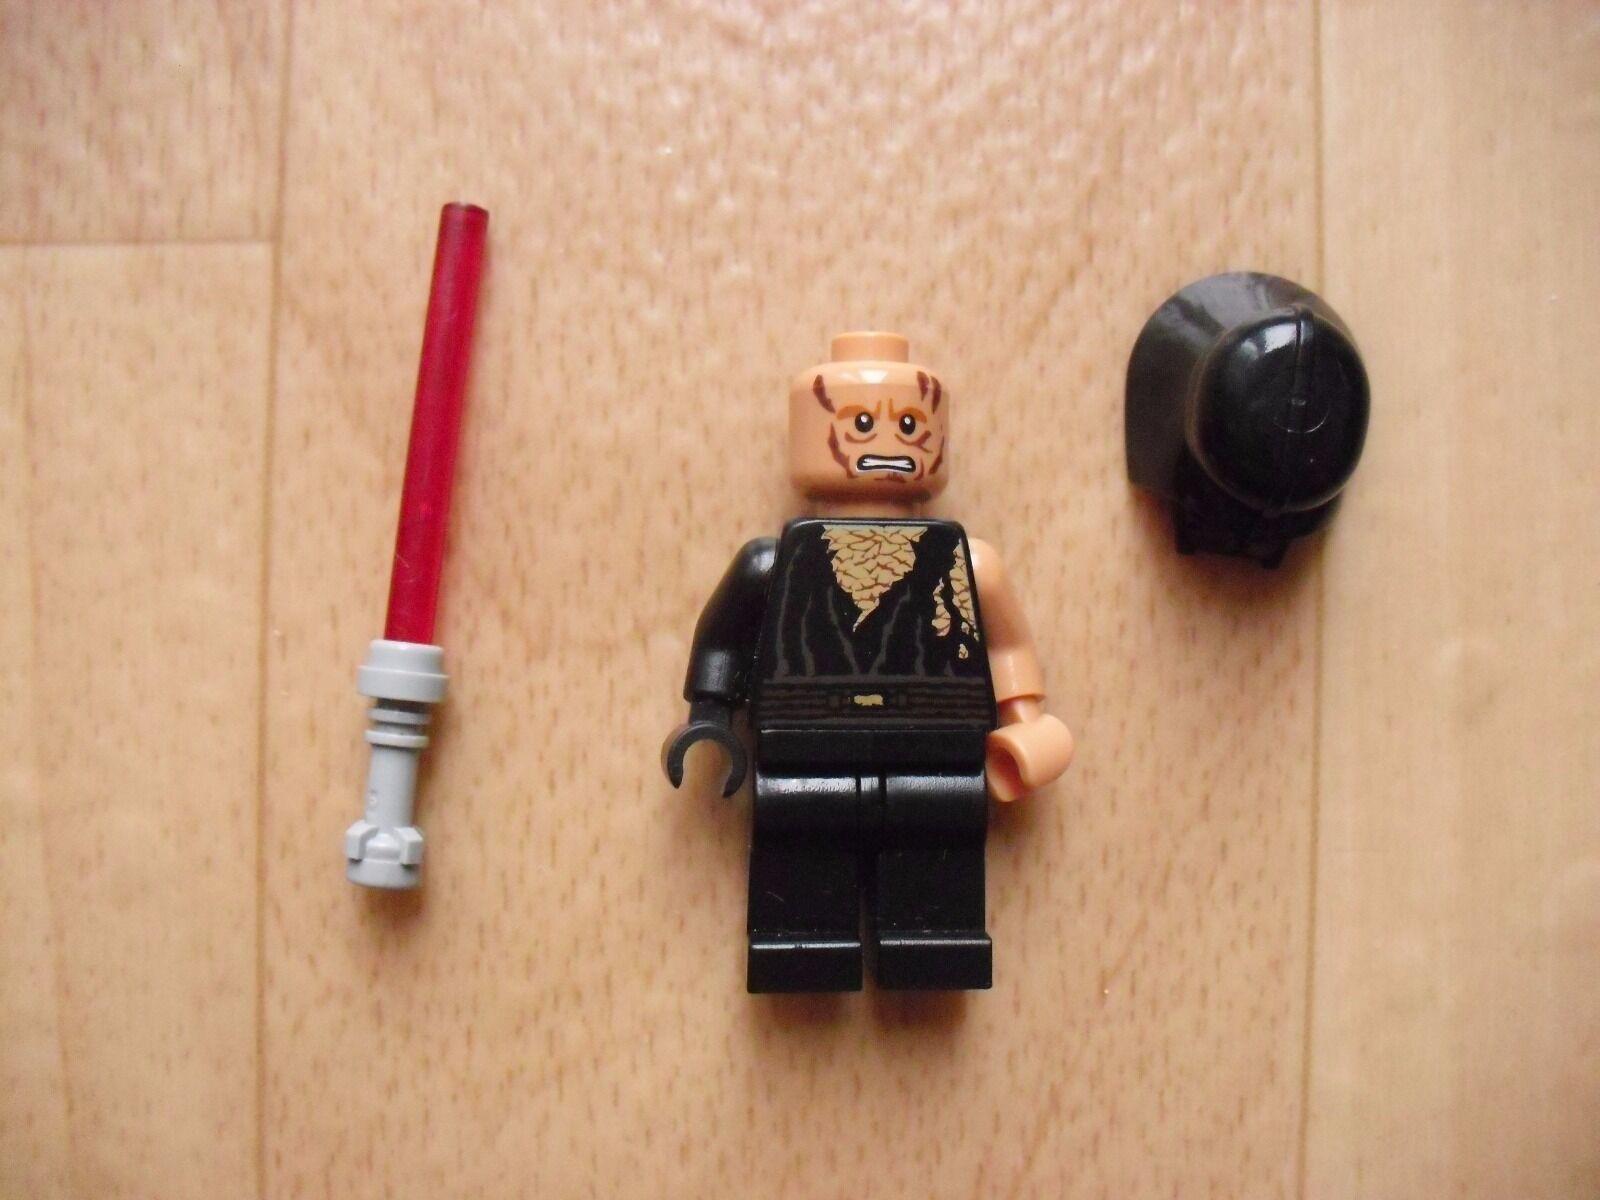 Lego Figur Skywalker  Star Wars  Minifigur Anakin Skywalker Figur aus Sammlung TOP 9b5dbc